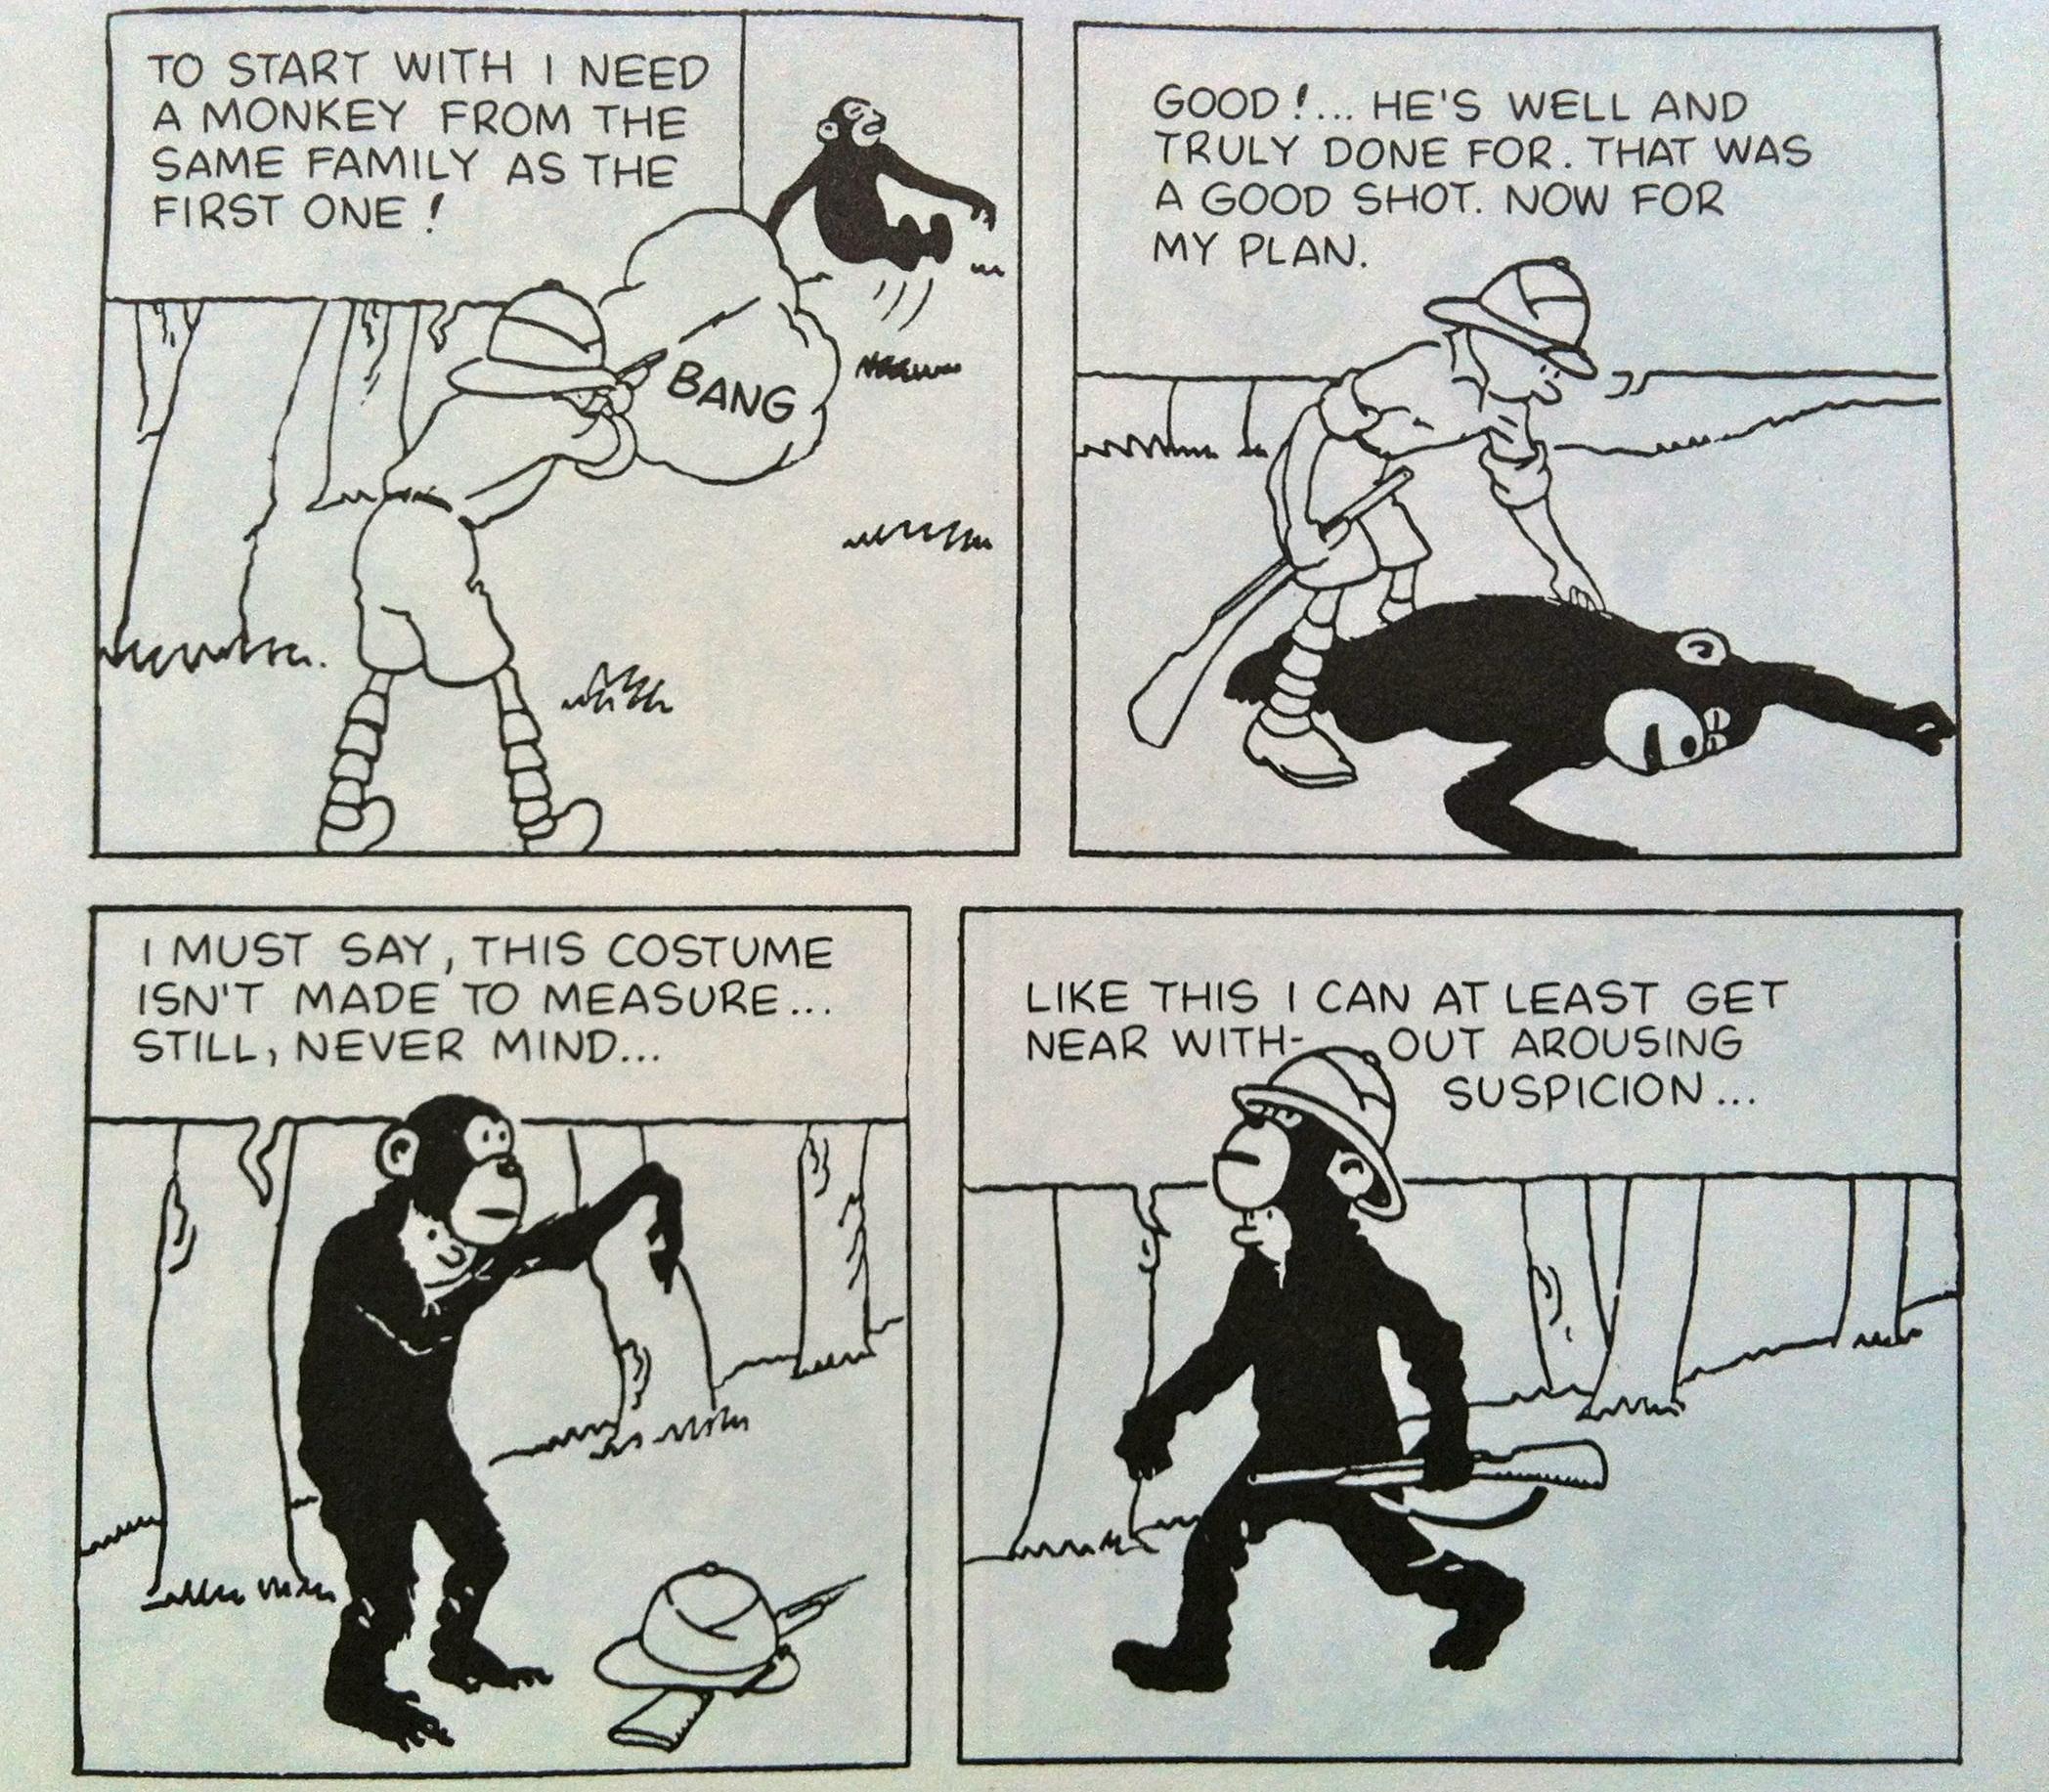 Tintin In The Congo Monkey Skinning 187 Eftm